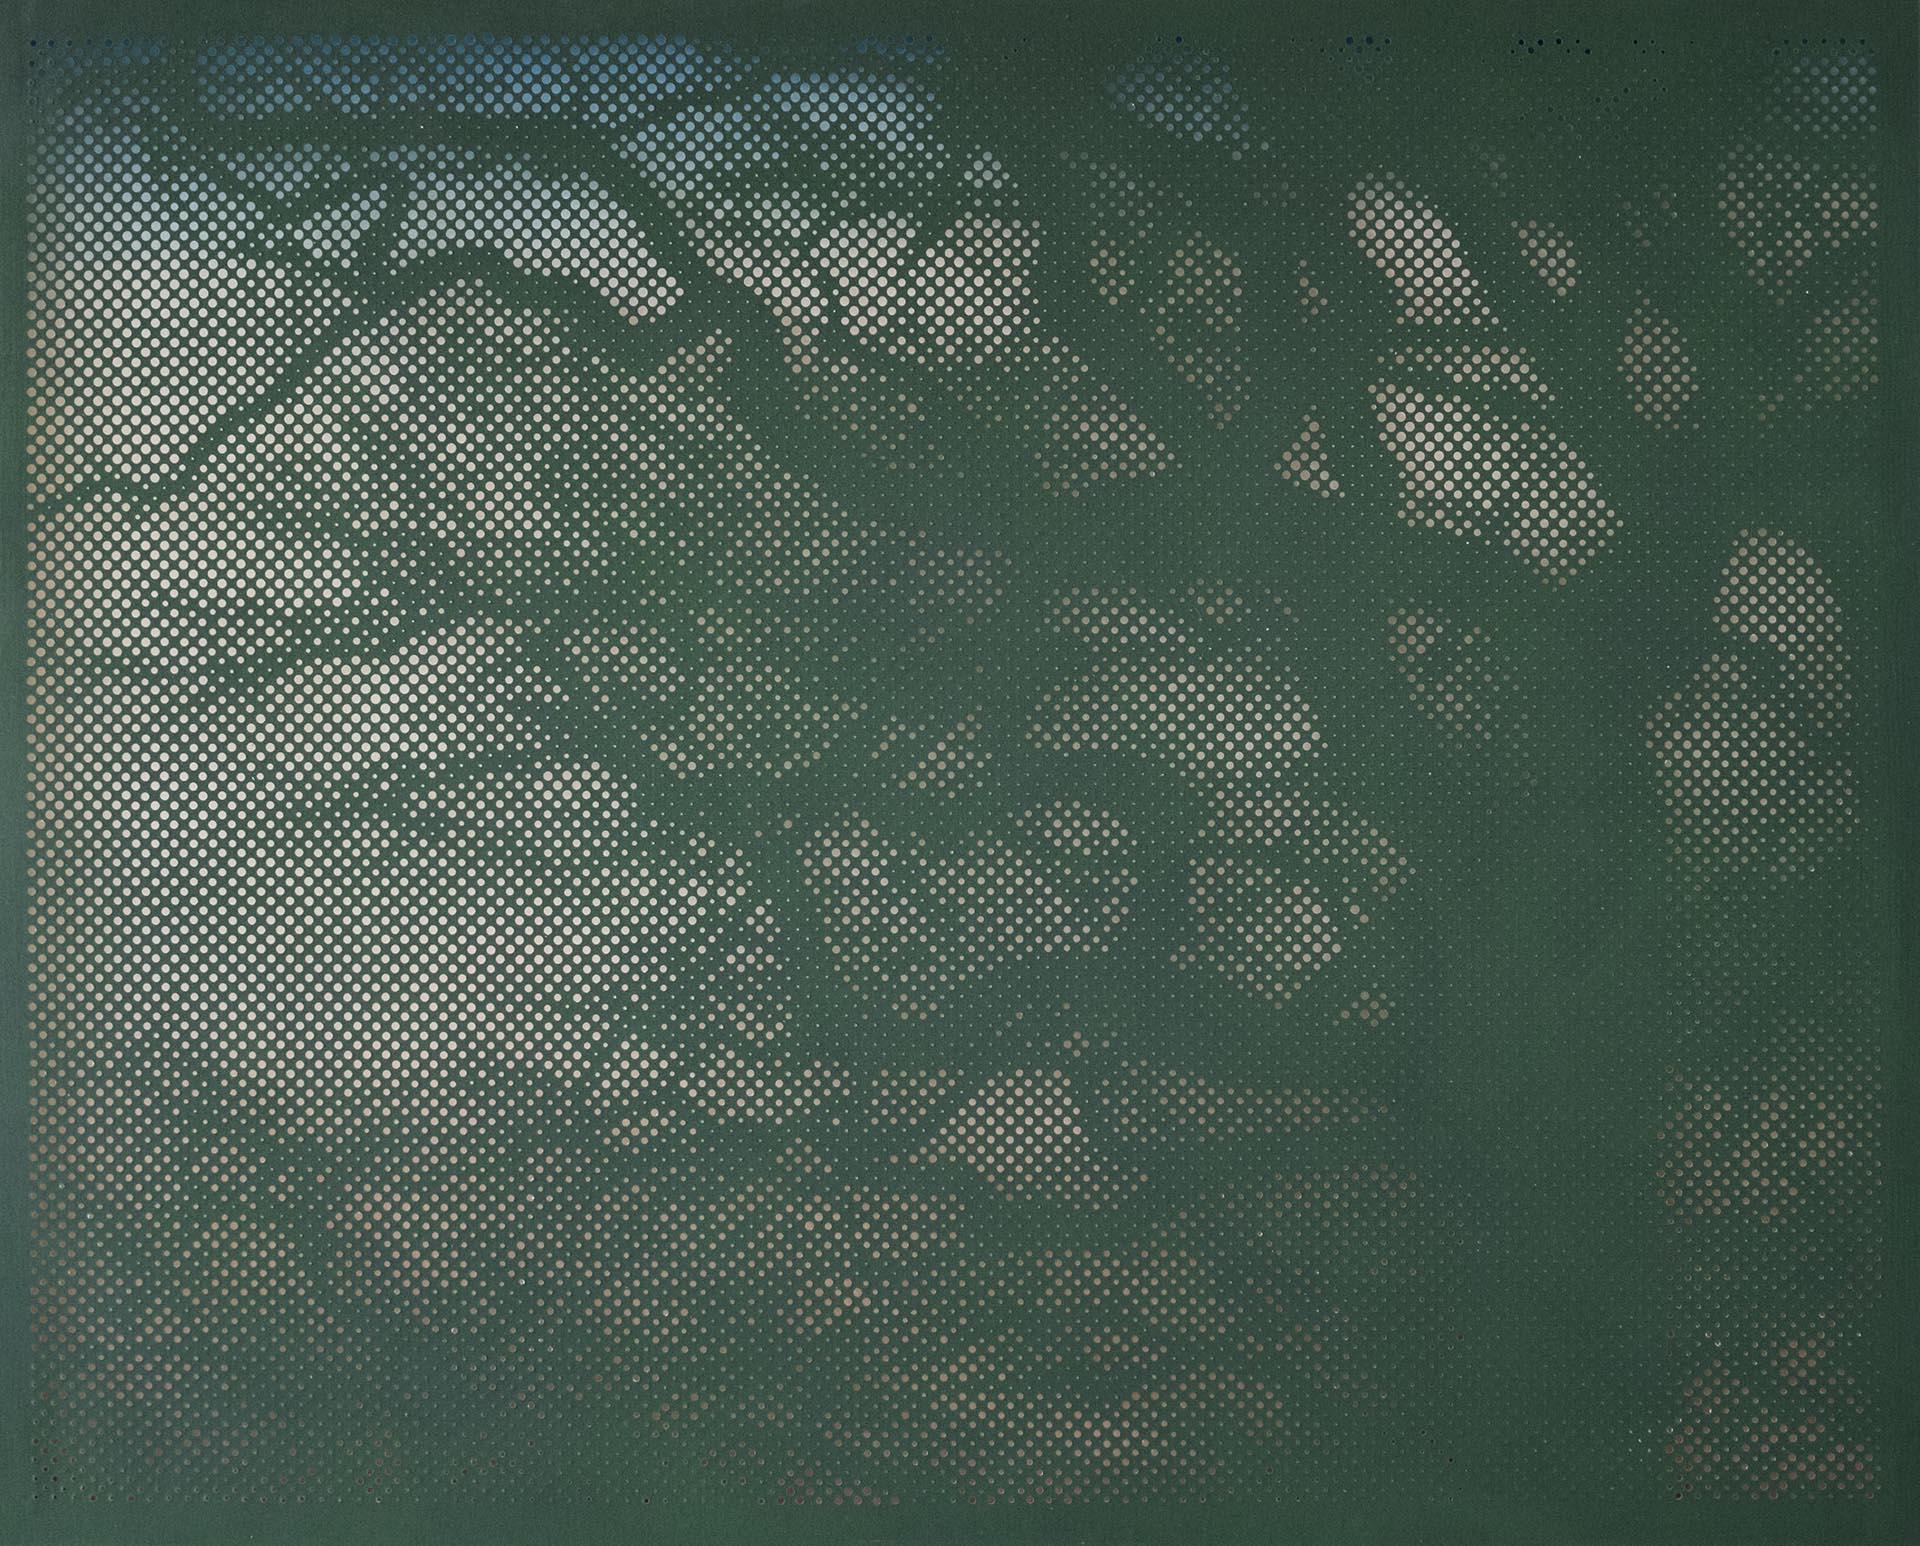 Furunes, Illuminated moments IX, 2016, 160x200 cm